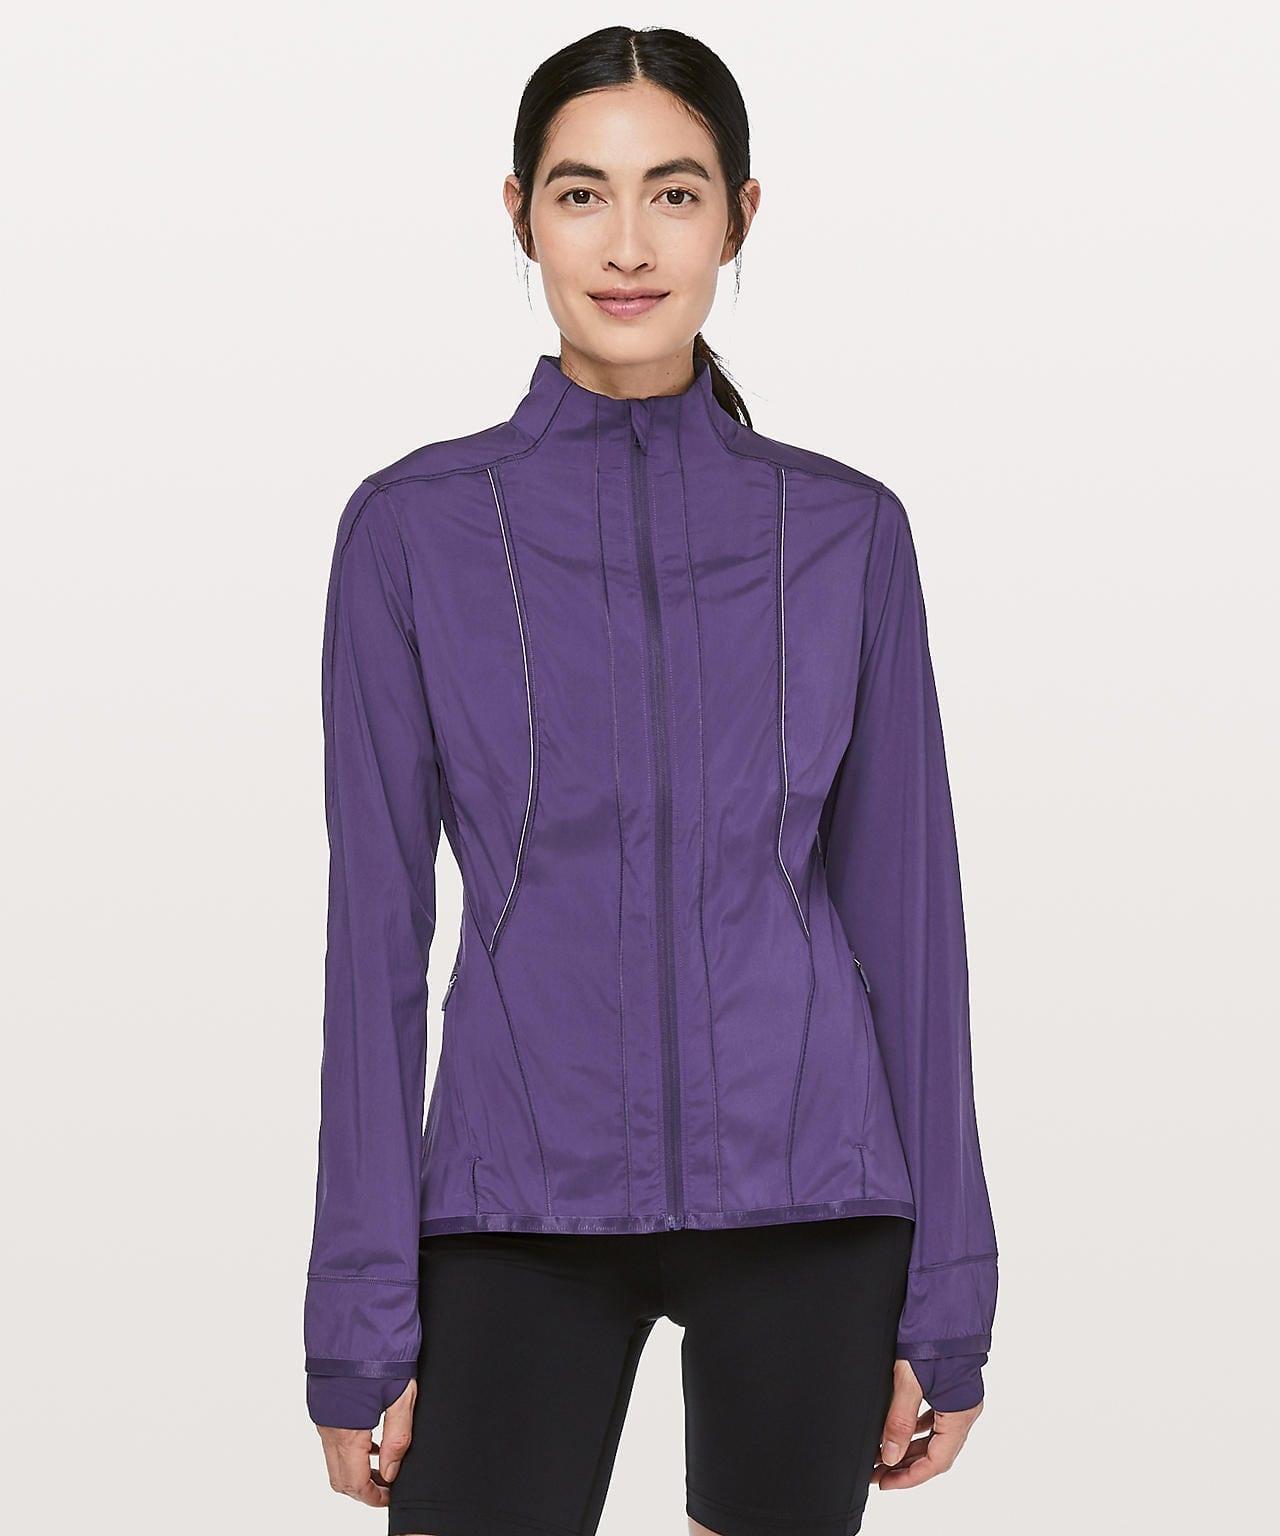 Laser Speed Jacket, Dark Court Purple, Lululemon Upload